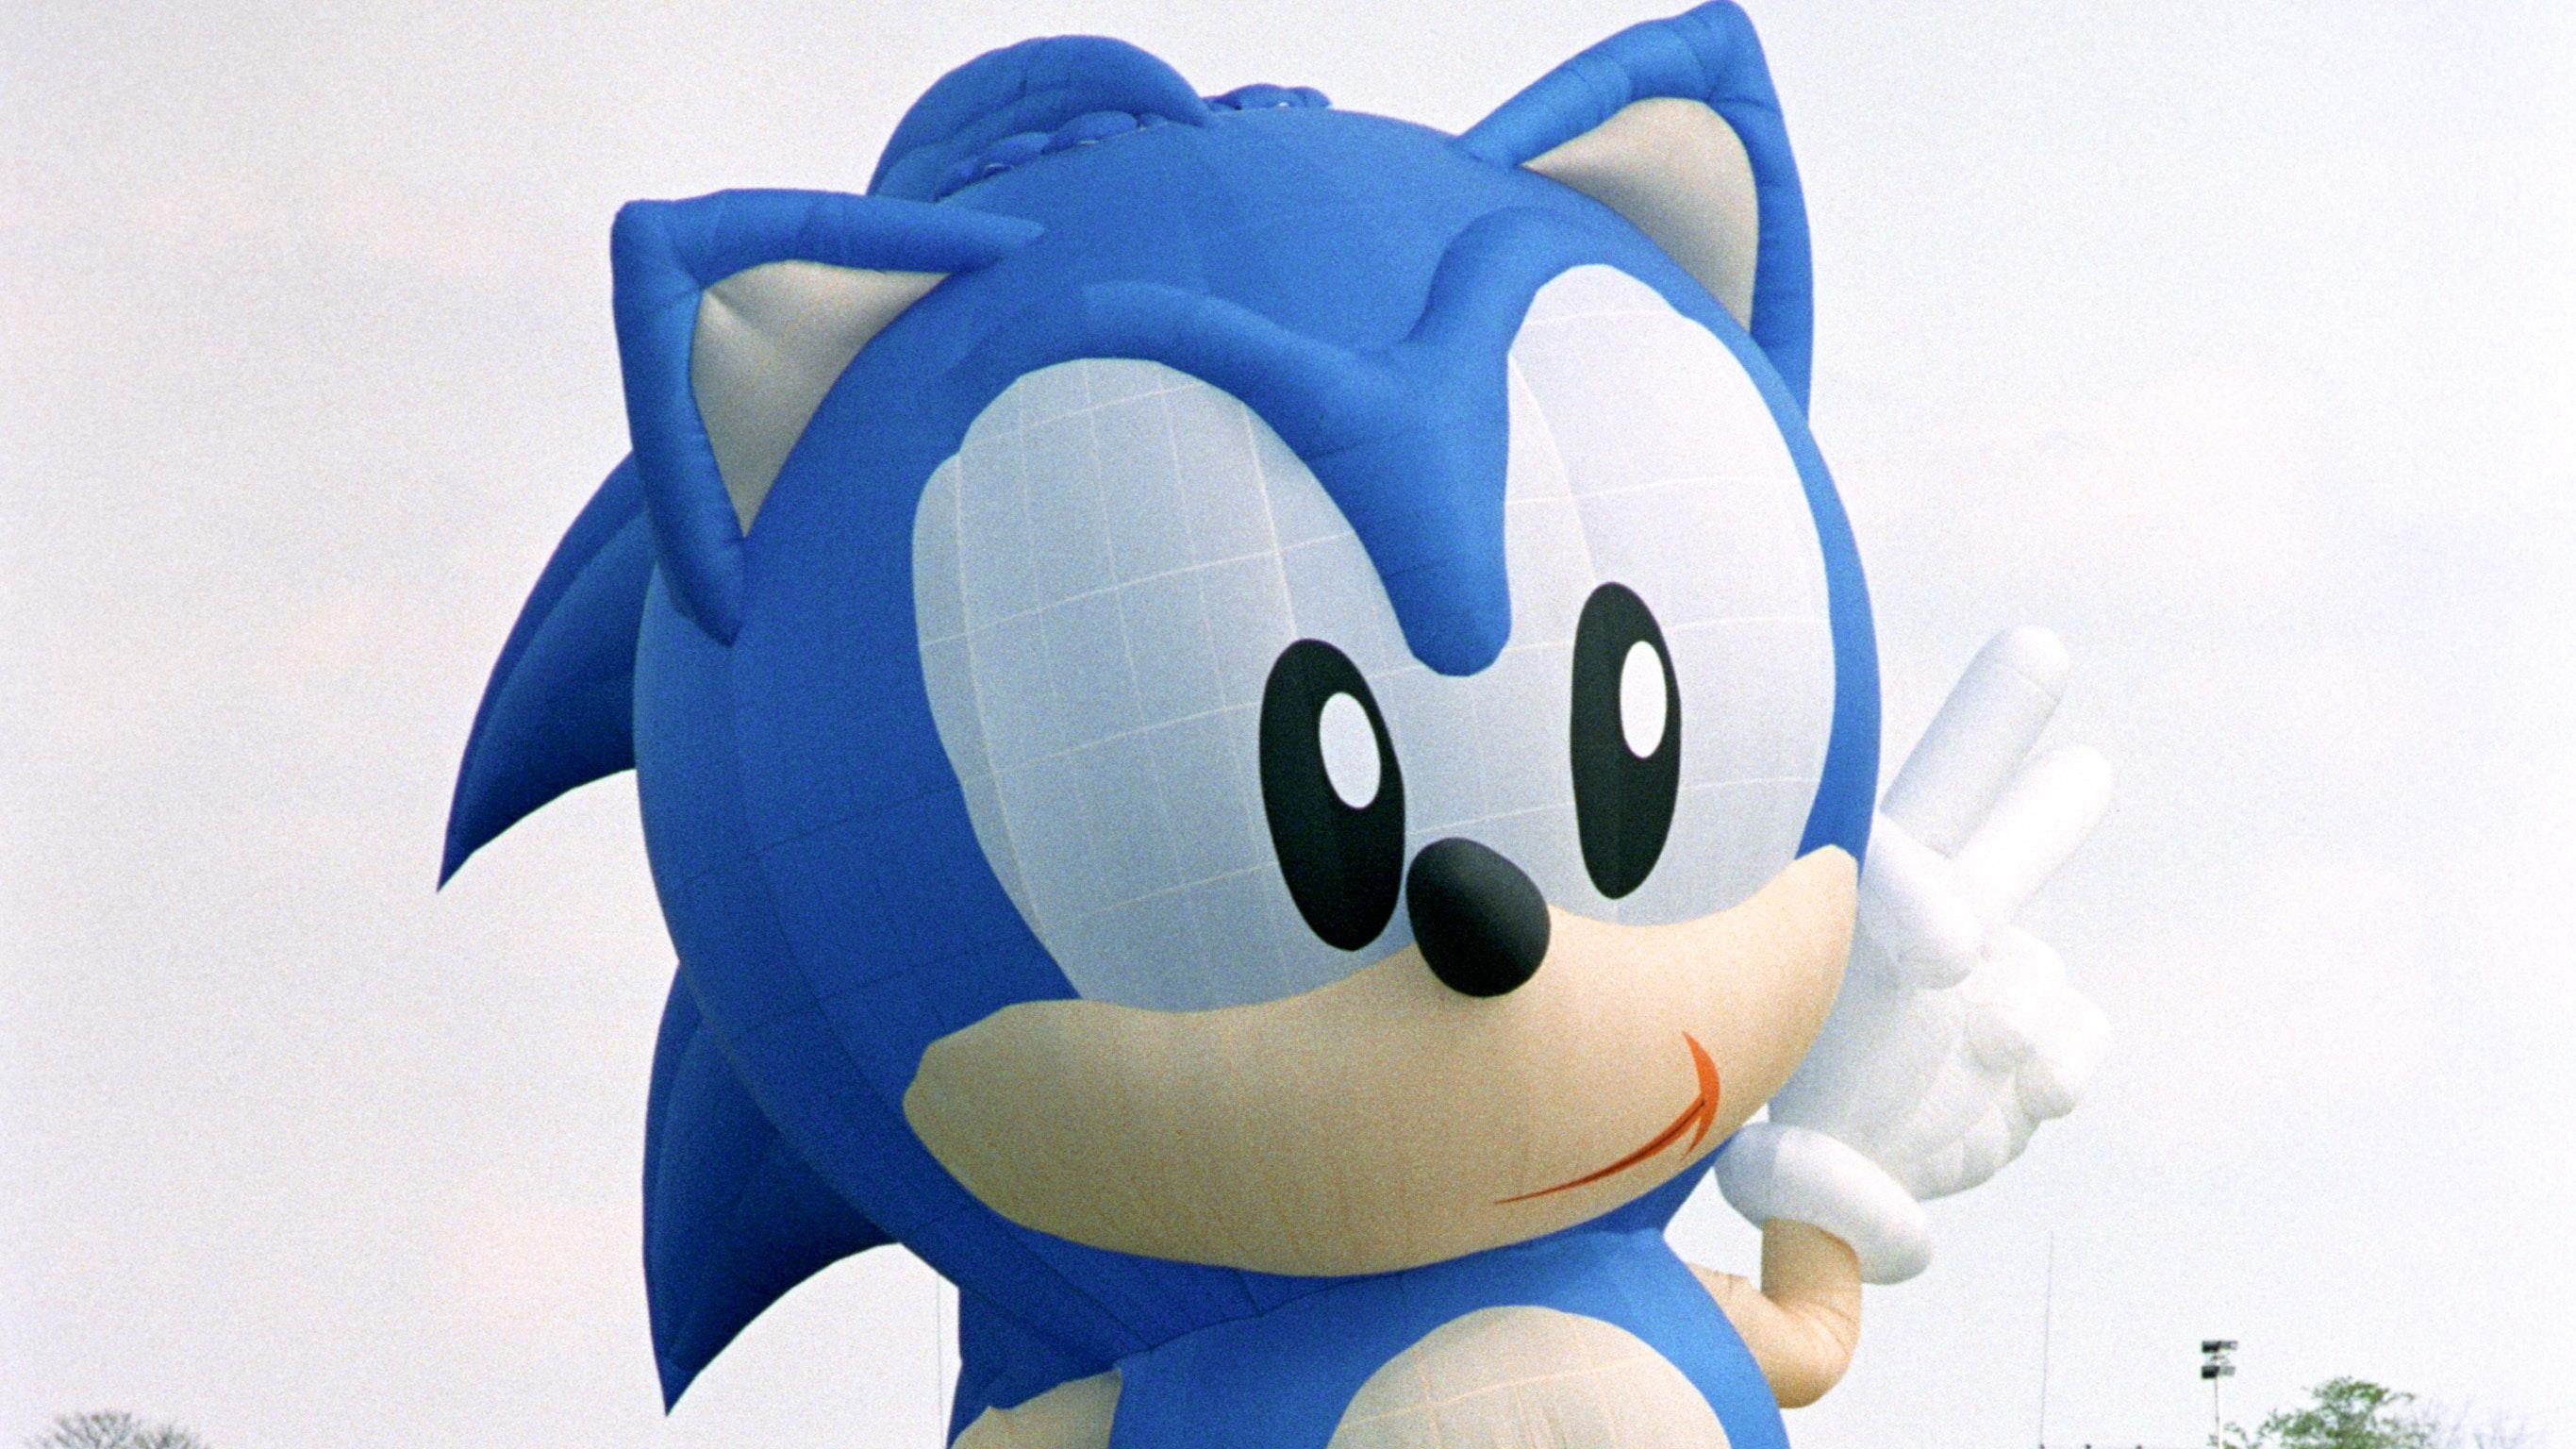 sonic the hedgehog - photo #44